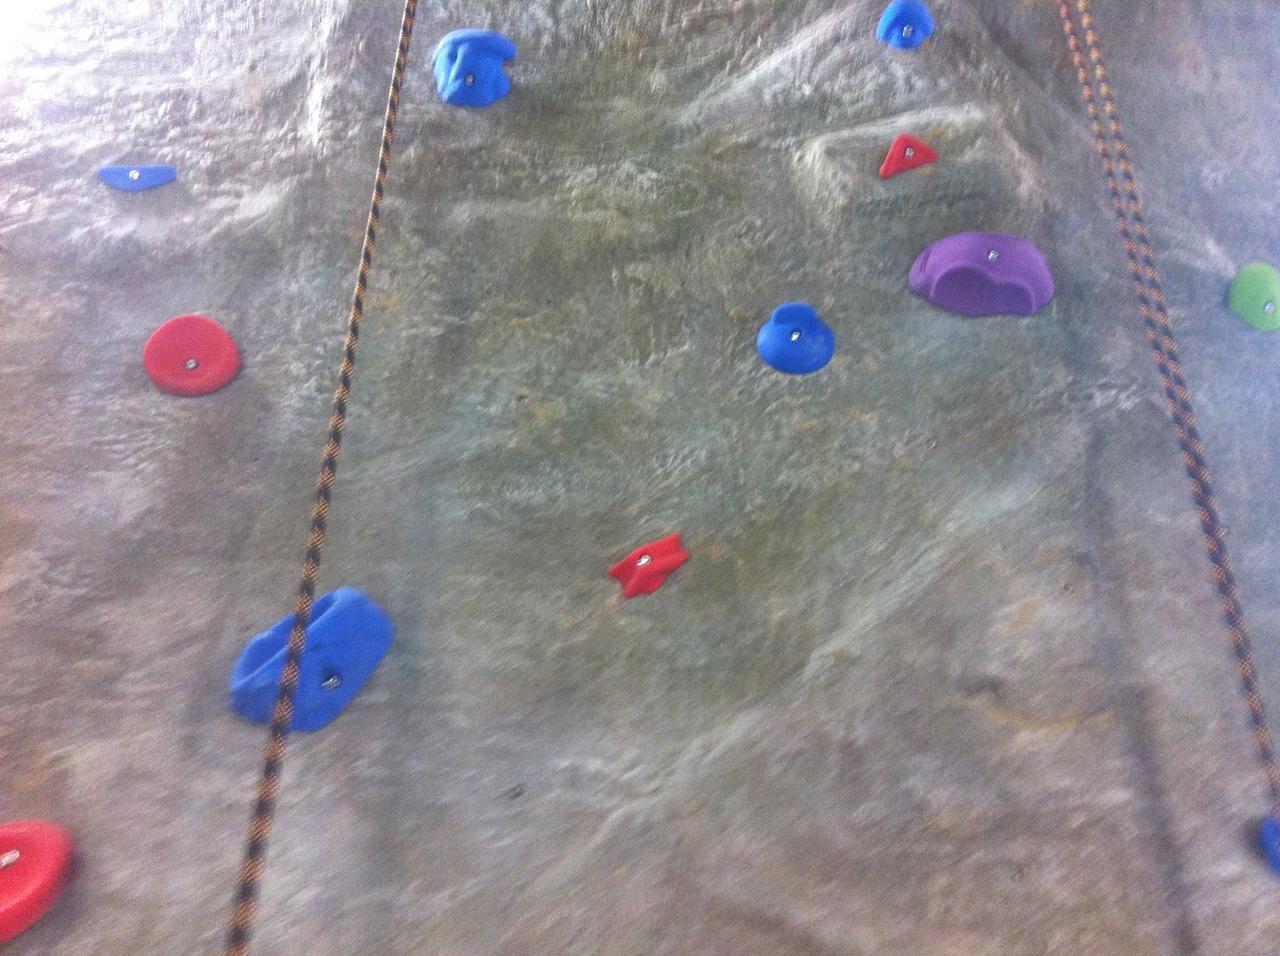 cementatious climbing wall texture